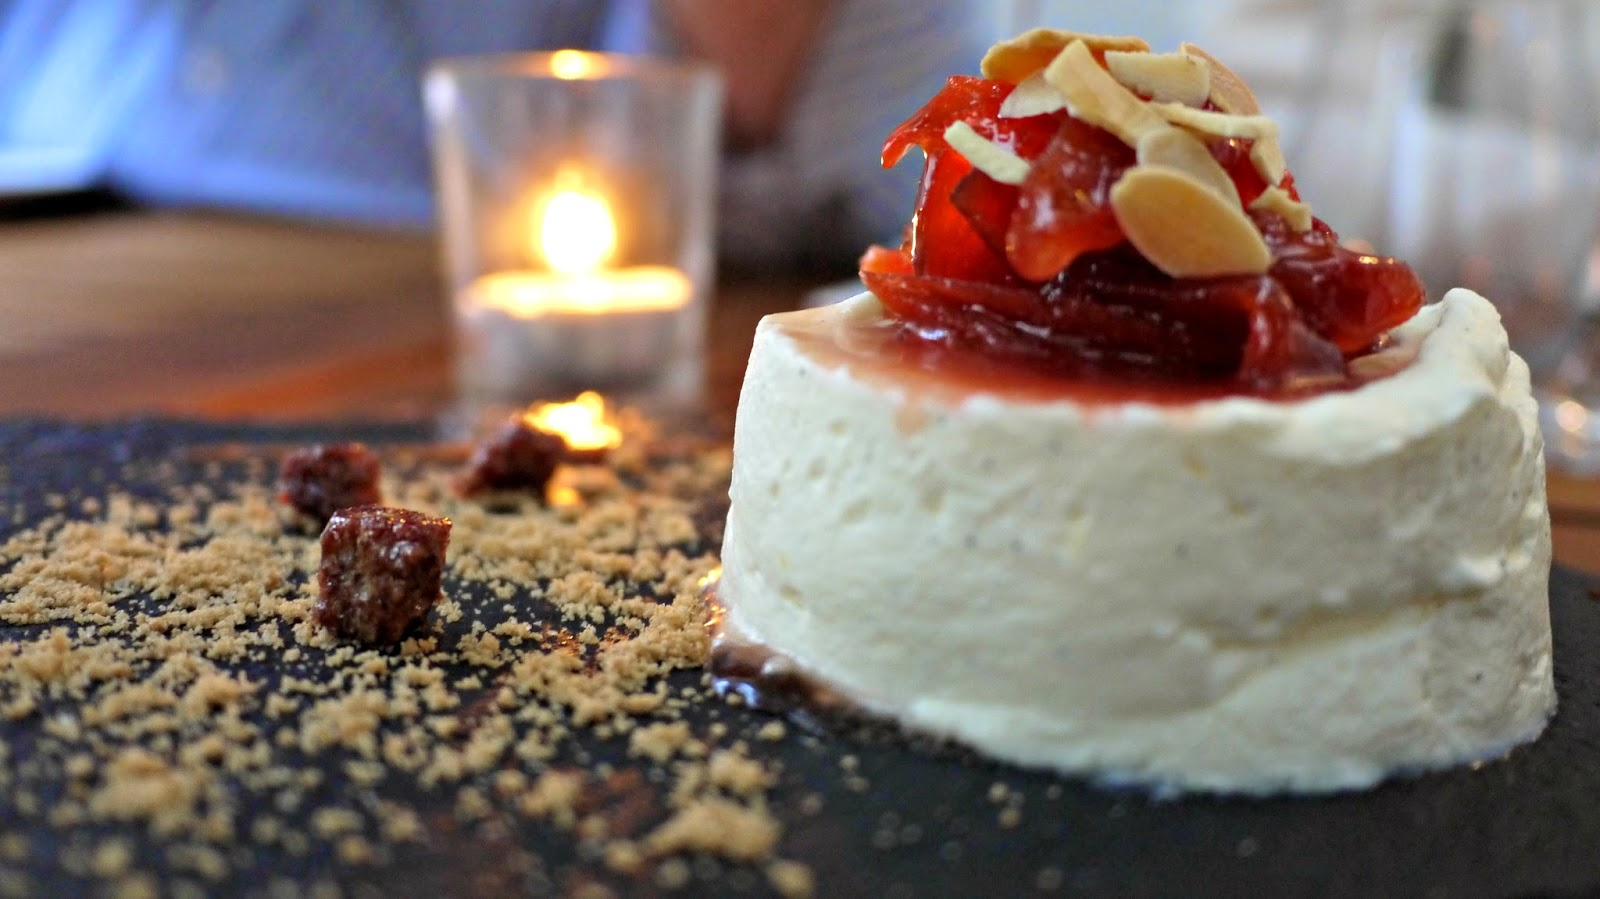 Mazi Greek Yoghurt mousse, quince pudding, cinnamon rusks